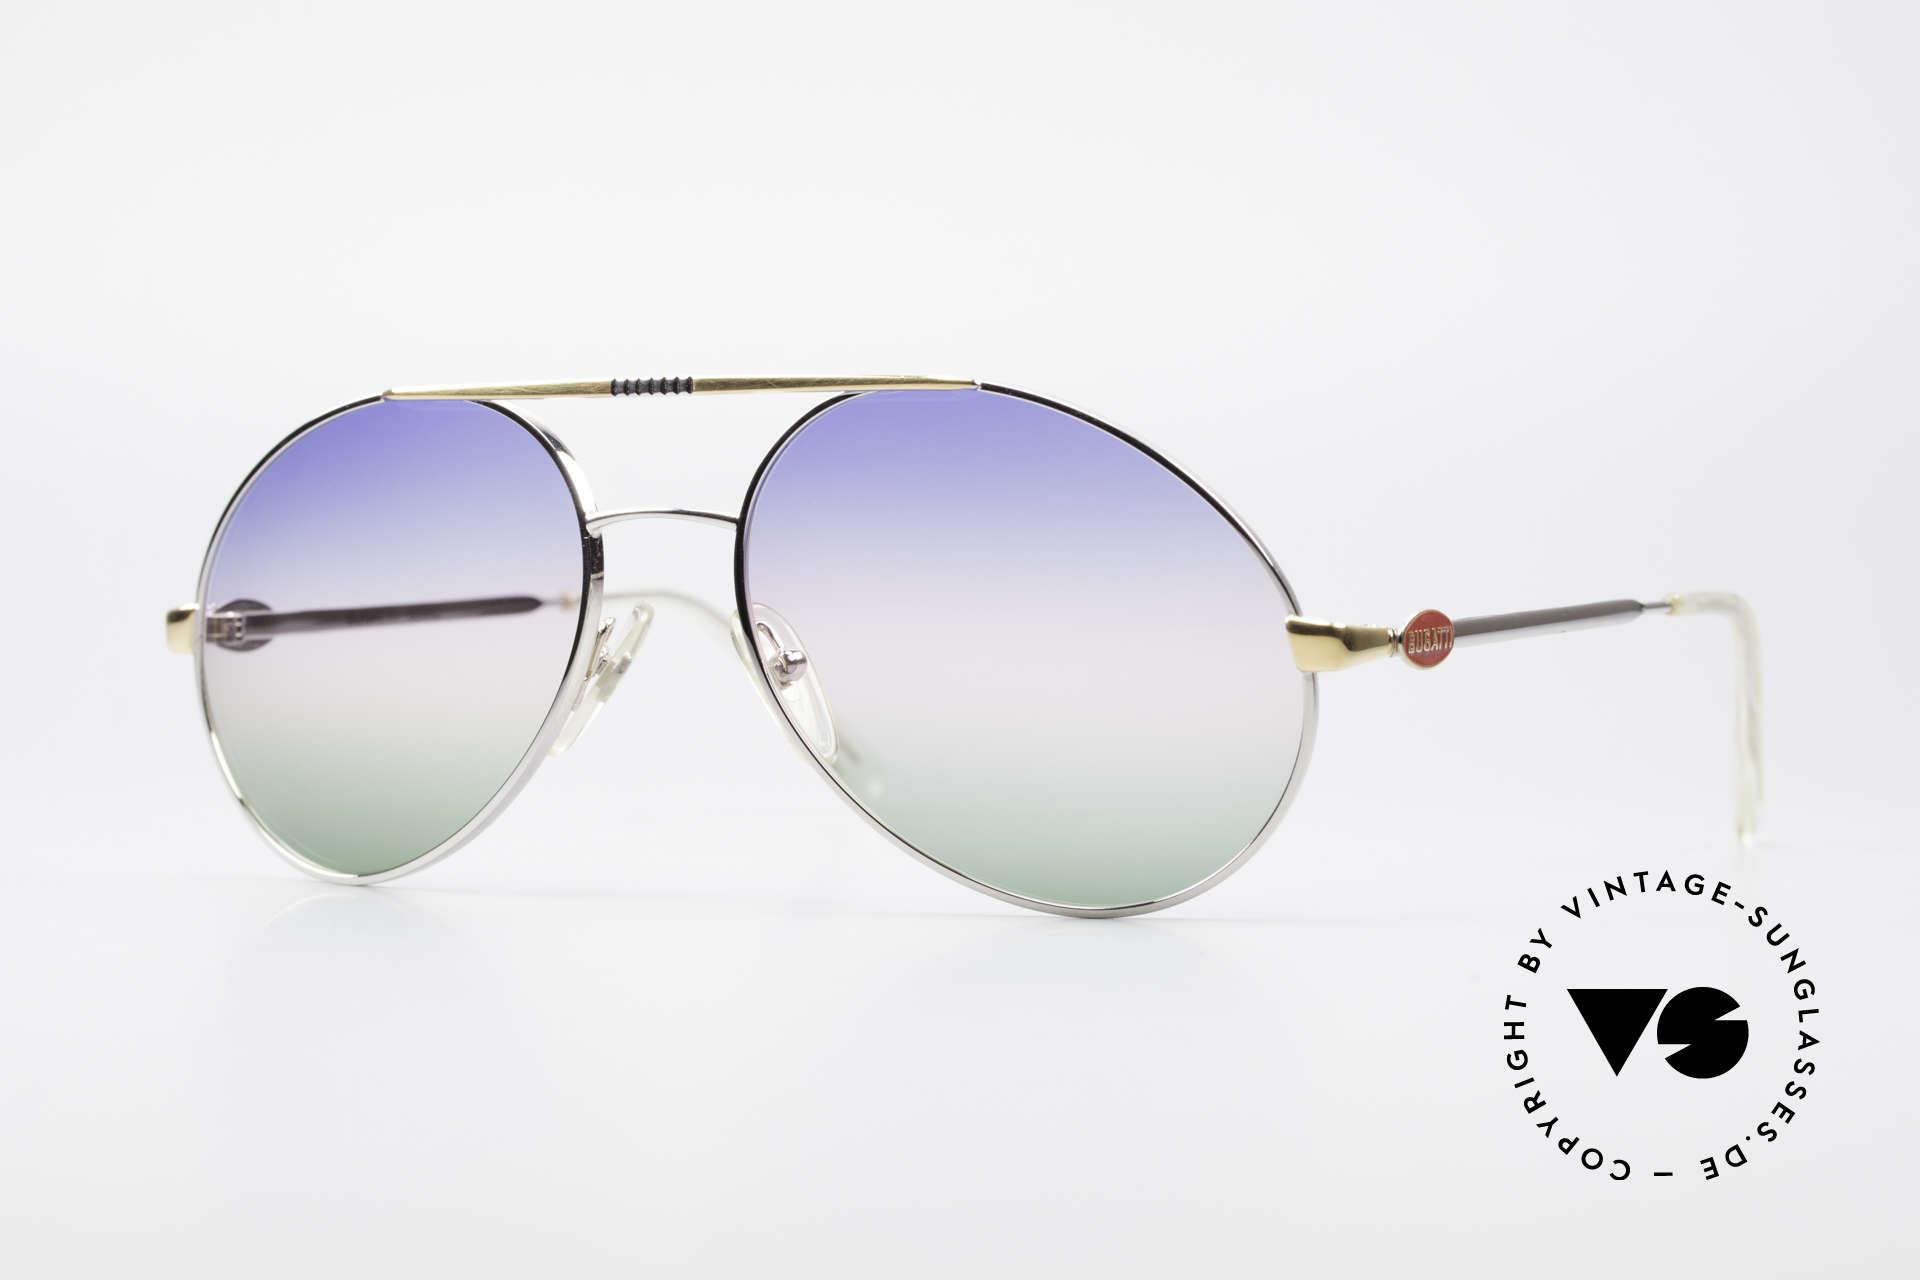 Bugatti 65982 Rare Vintage 80er Sonnenbrille, klassische 80er Bugatti Designer Sonnenbrille, Passend für Herren